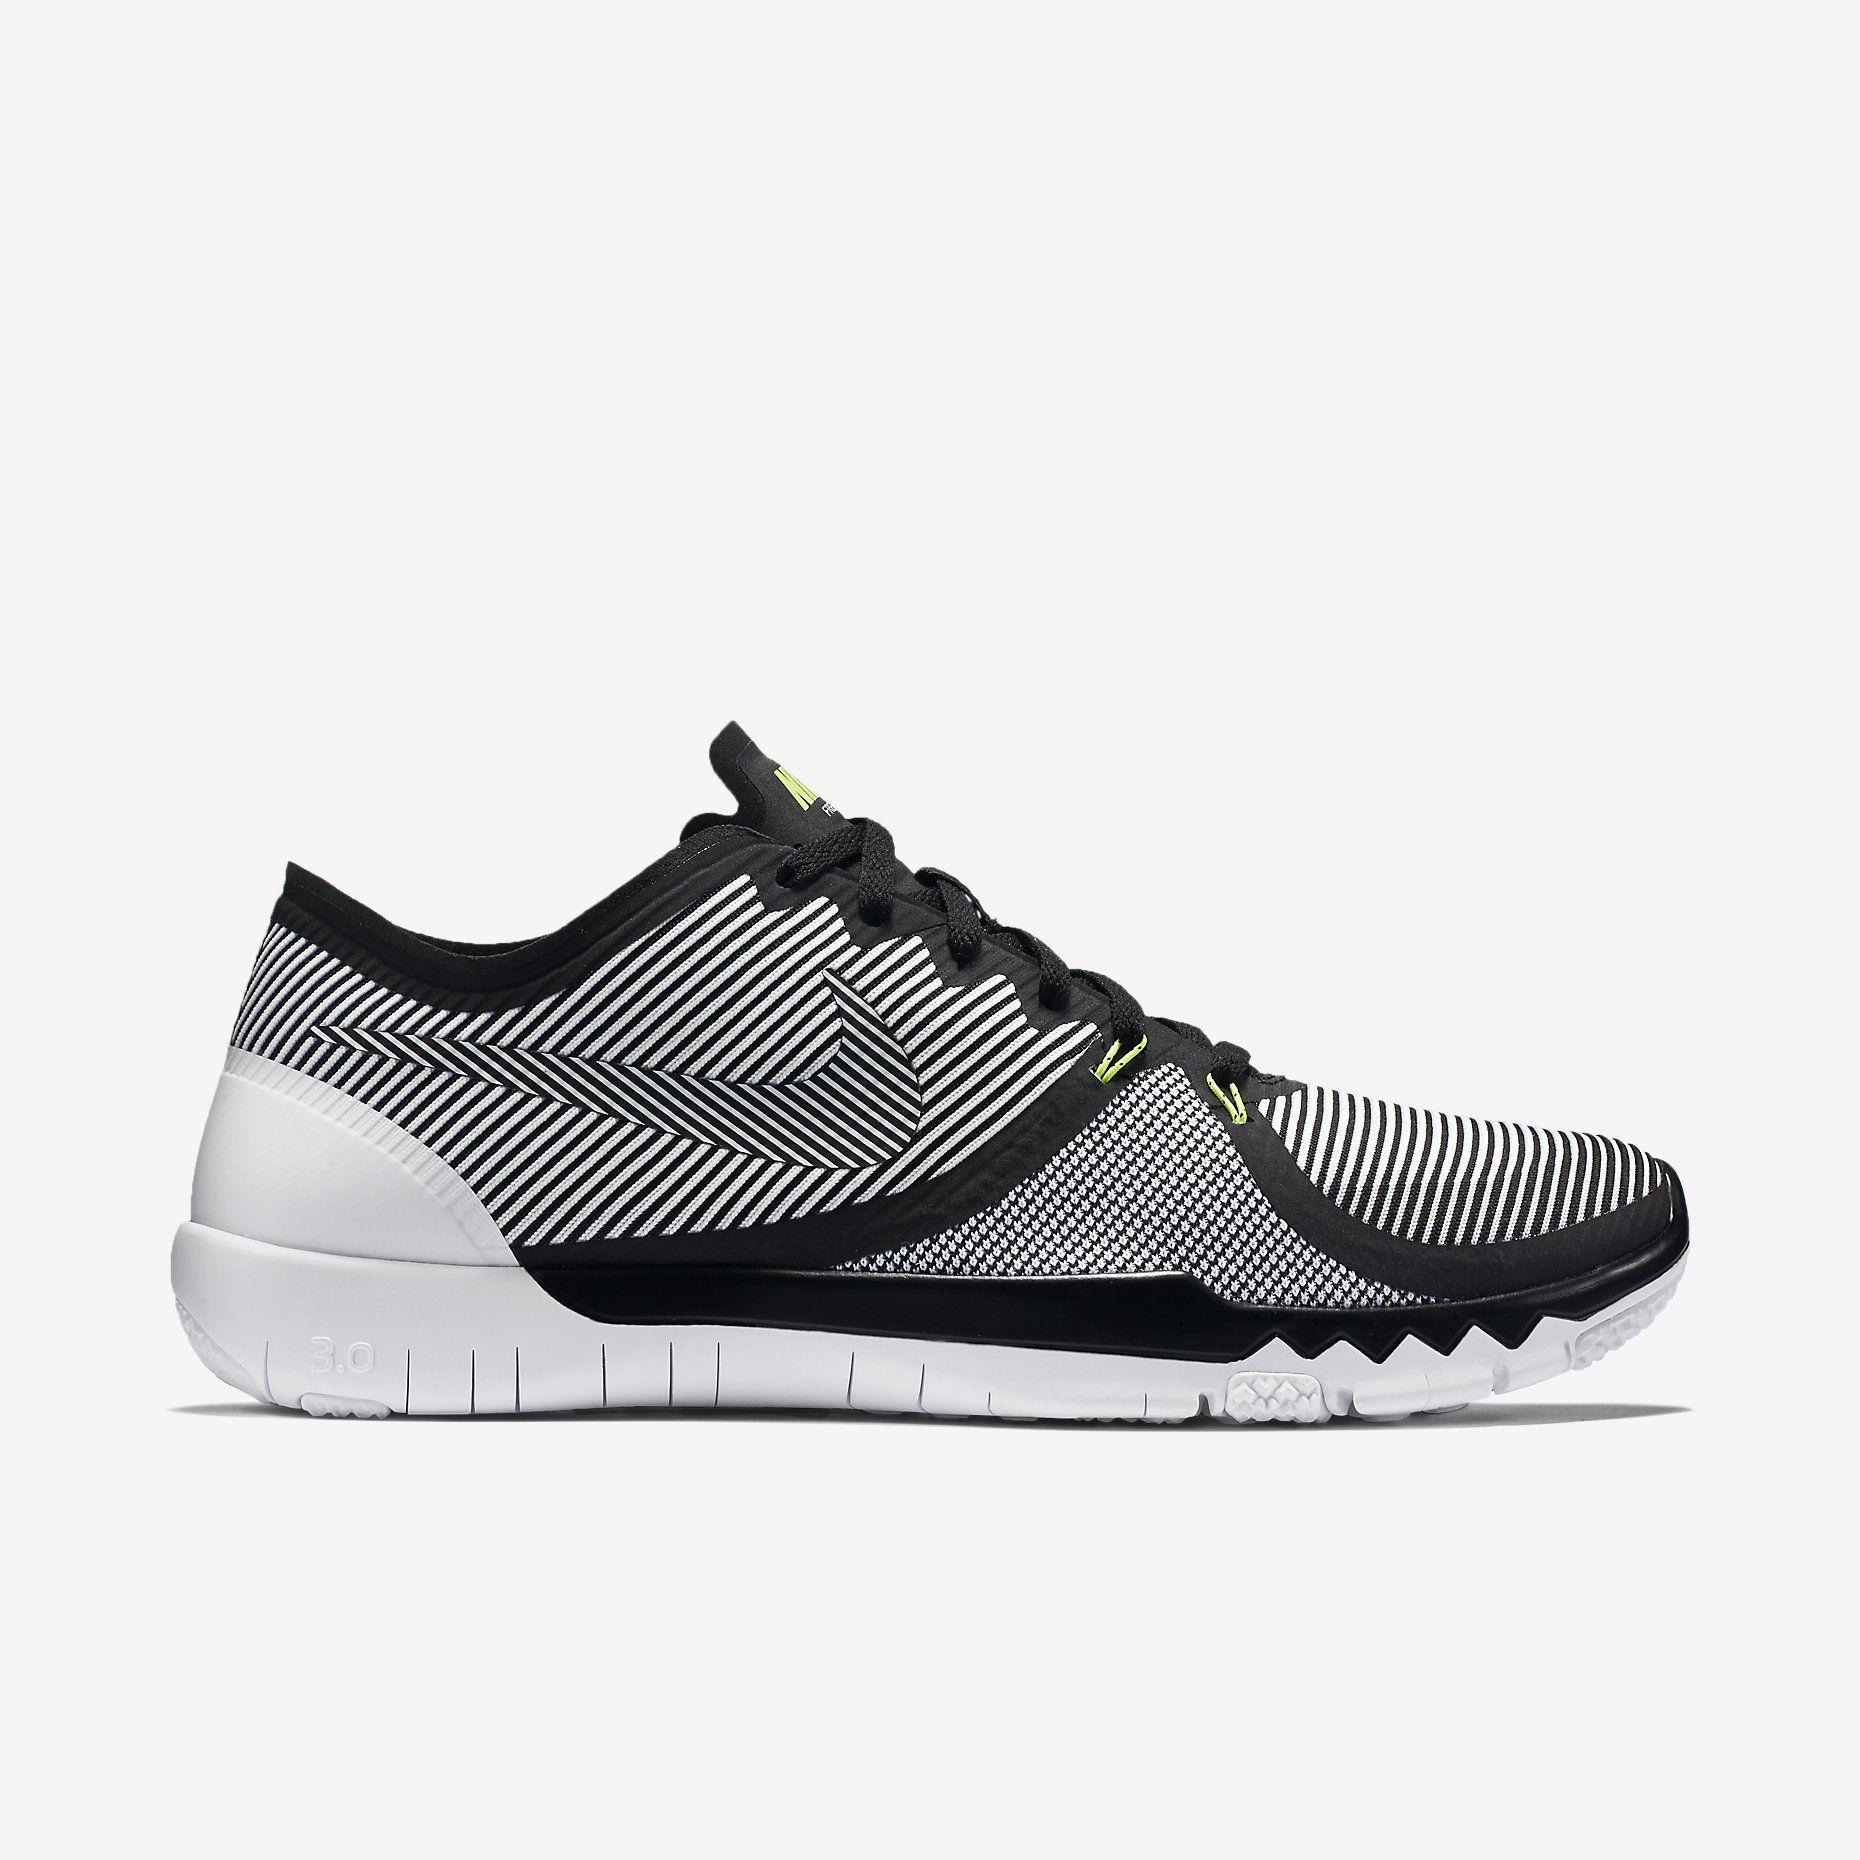 Nike Free Trainer 3.0 V4 Men's Training Shoe. Nike Store || Follow @filetlondon for more street style #filetlondon